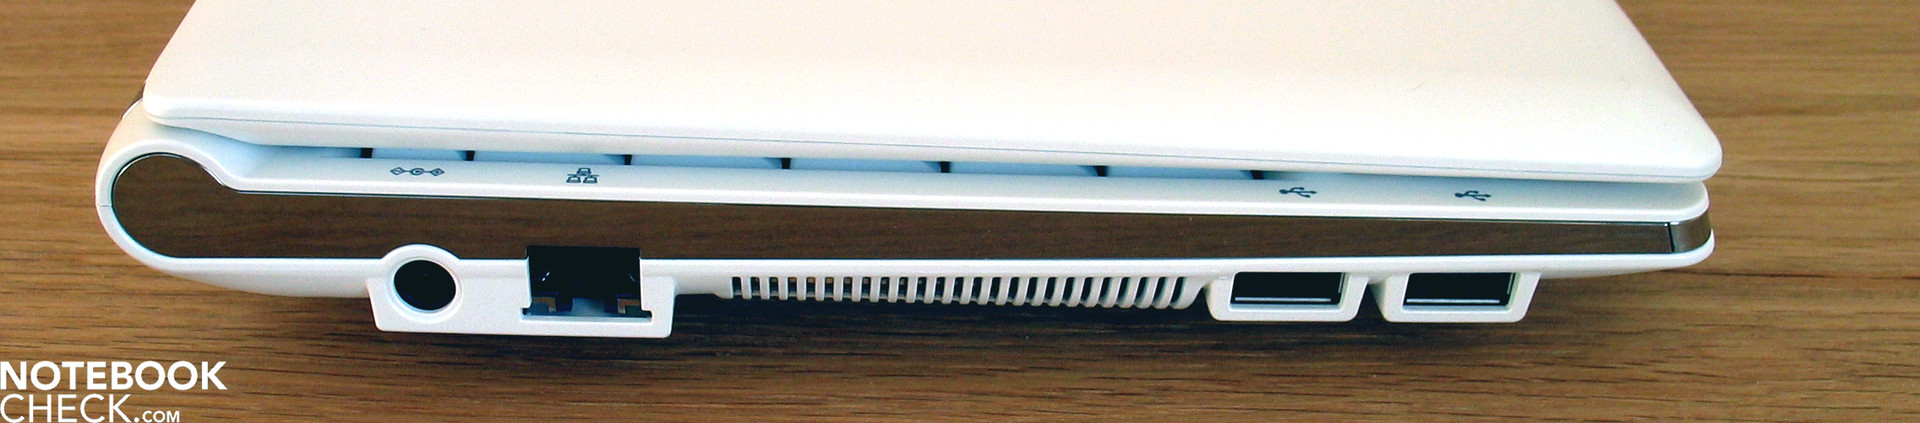 Sony Vaio VPCF12FFX/B Marvell 88E8040 LAN Mac